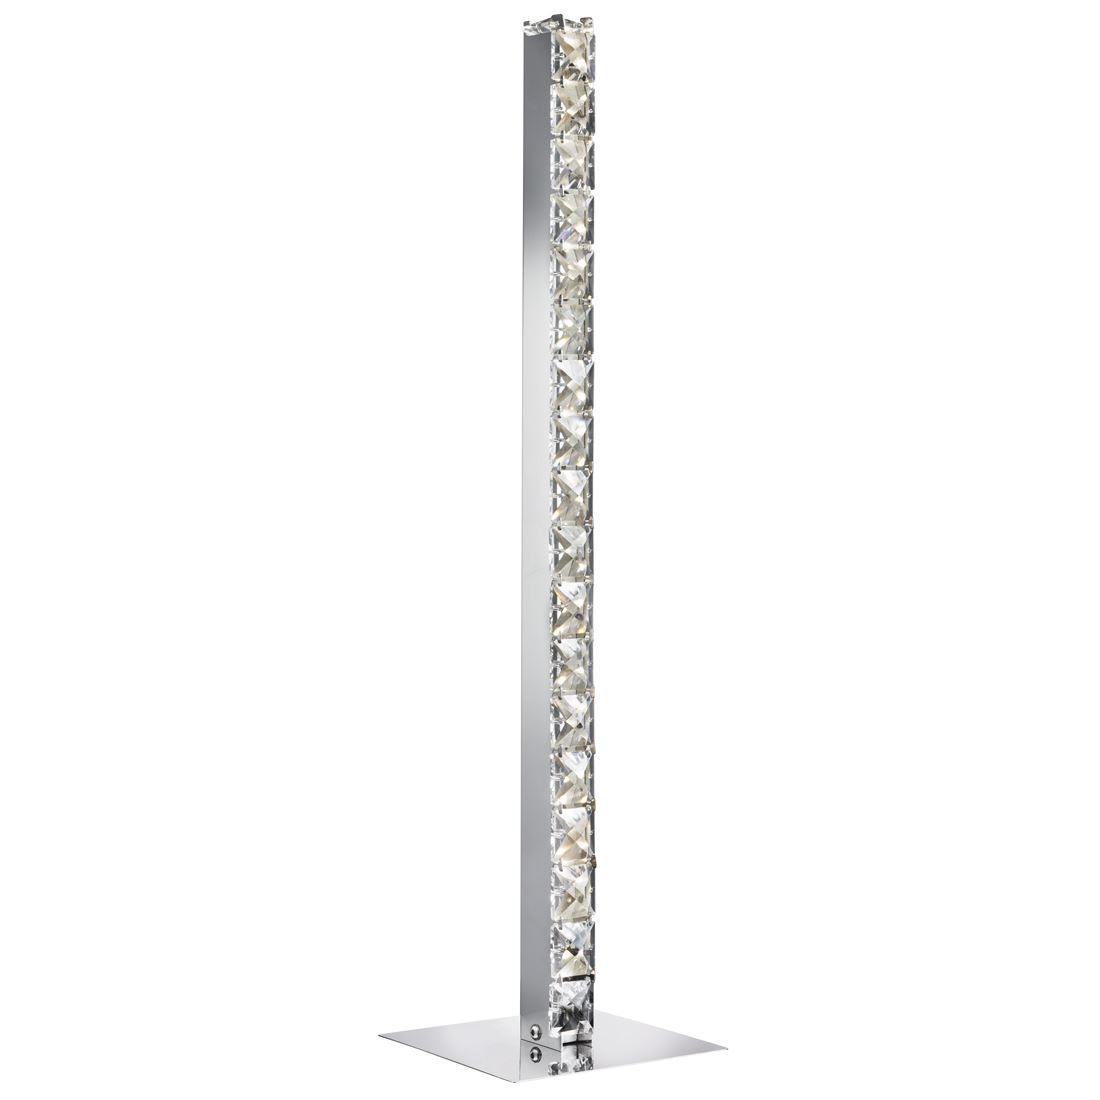 Led Column Table Lamp,Chrome,Clear Crystal Trim - Modern Design